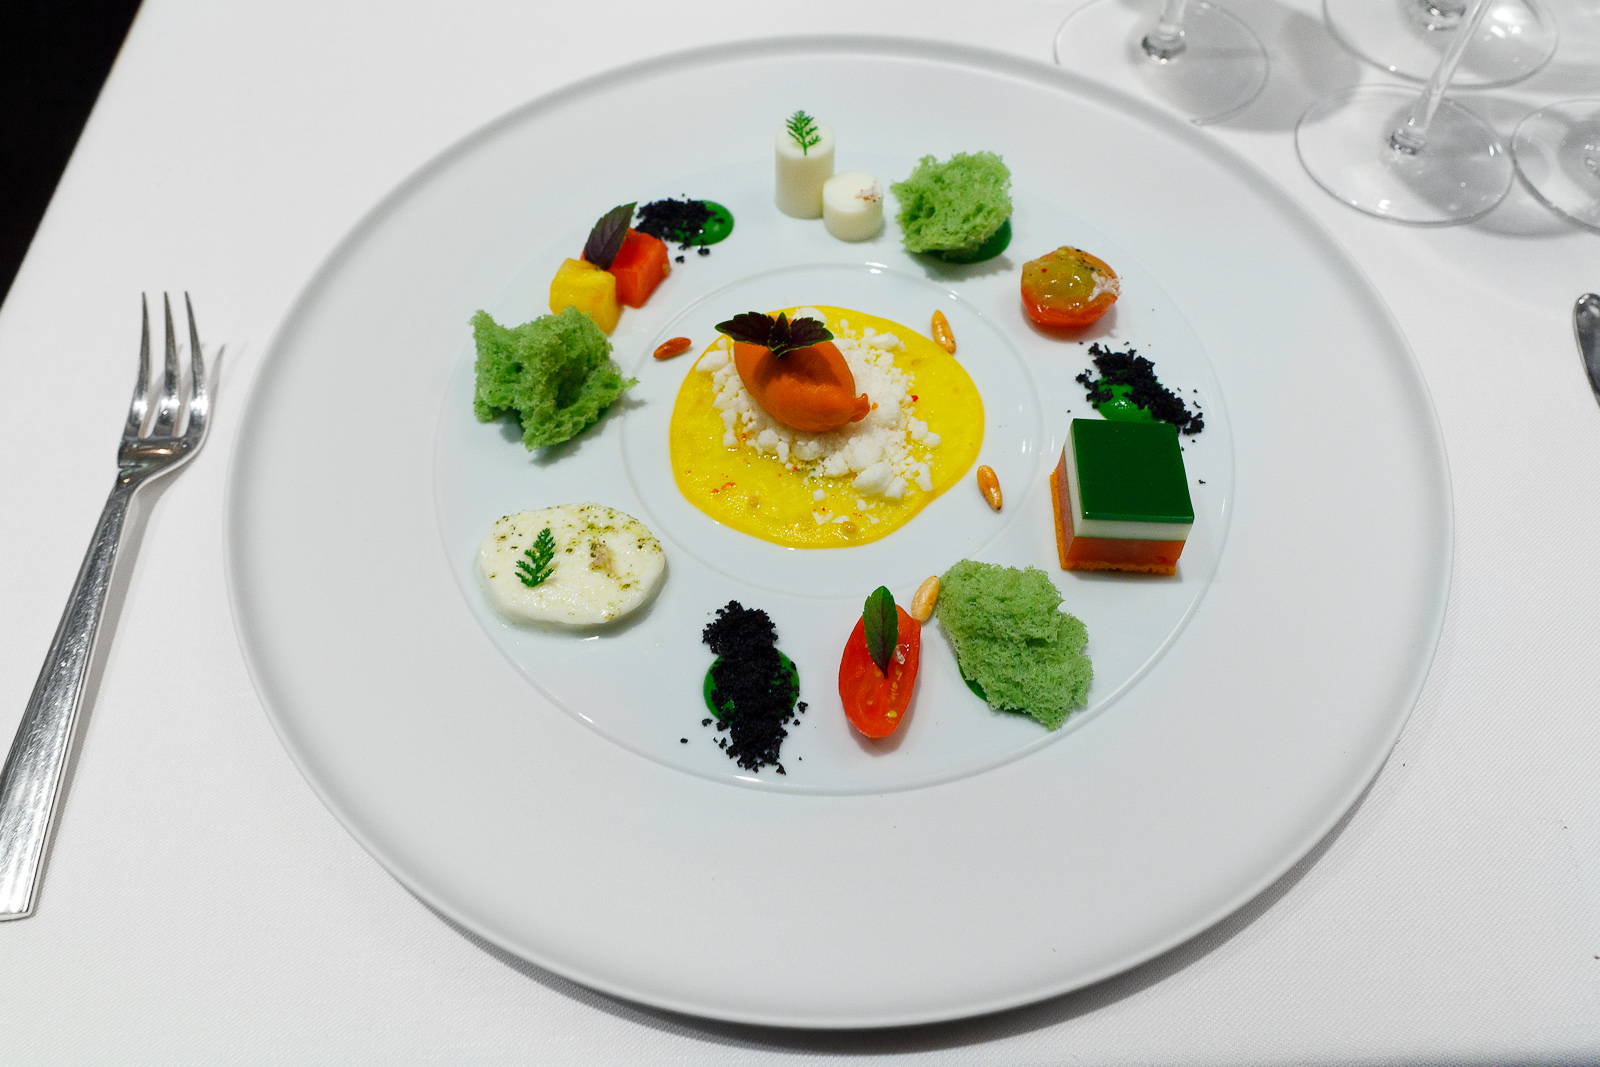 2nd Course: Summer tomatoes, buffalo mozzarella, basil, tomato tea, by Nils Henkel